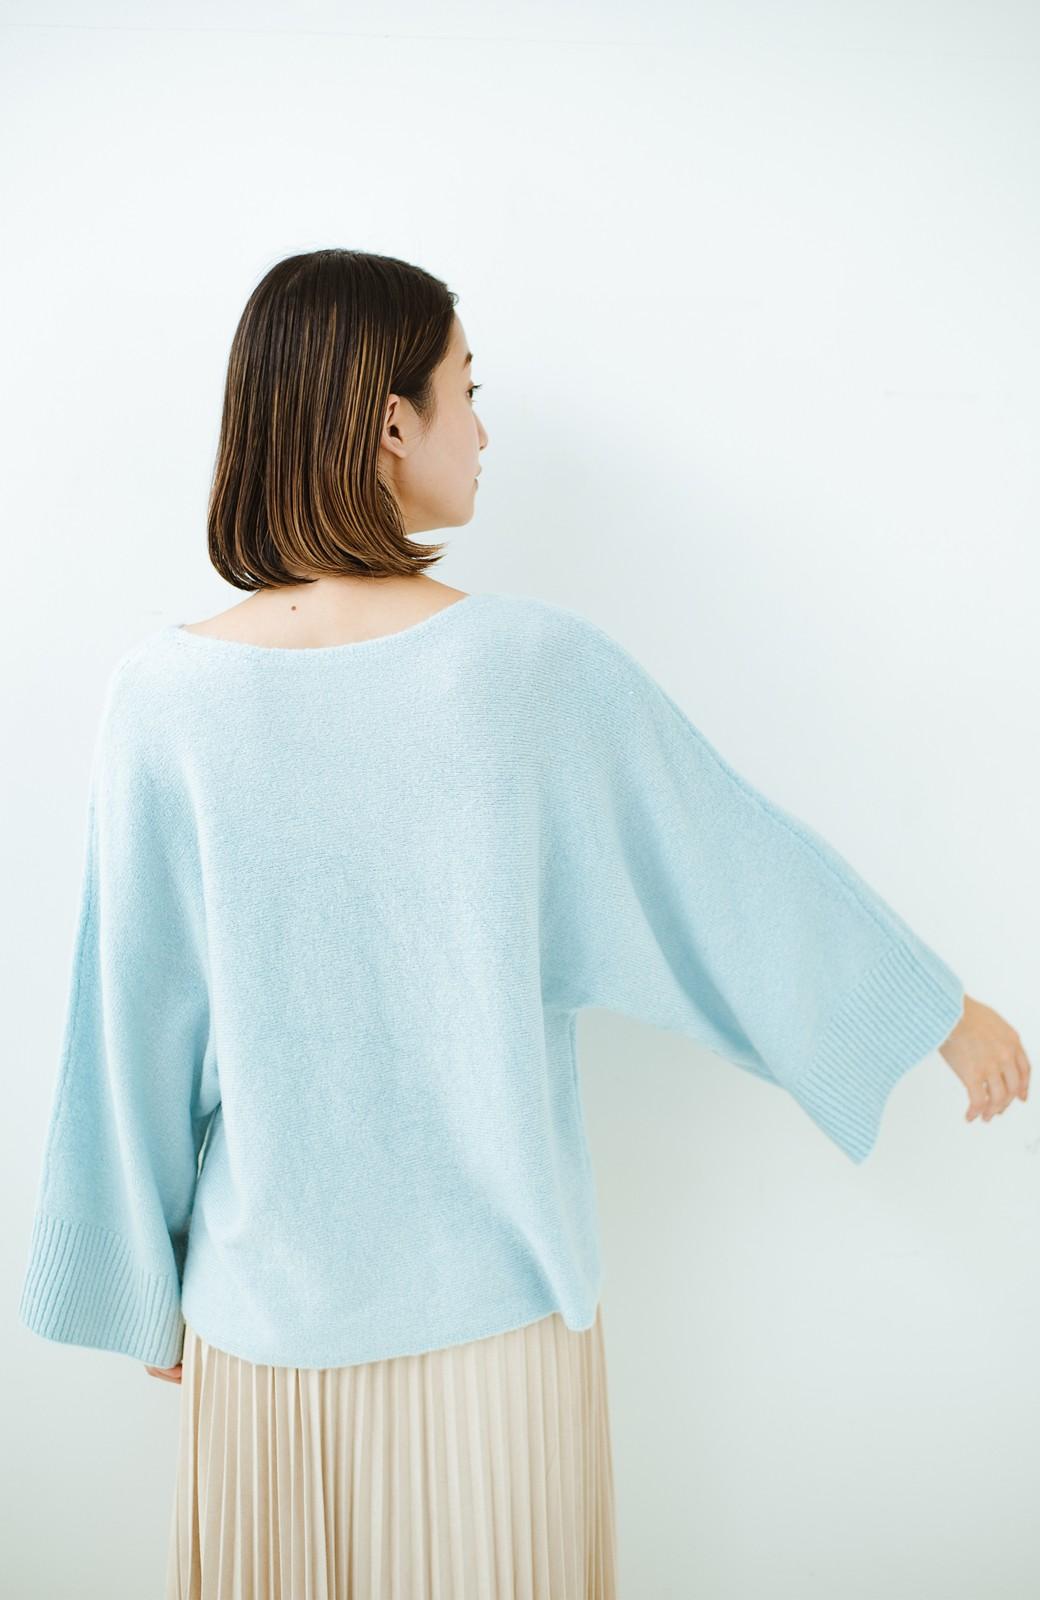 haco! 太め袖がかわいい横編みプルオーバーニット <ライトブルー>の商品写真18